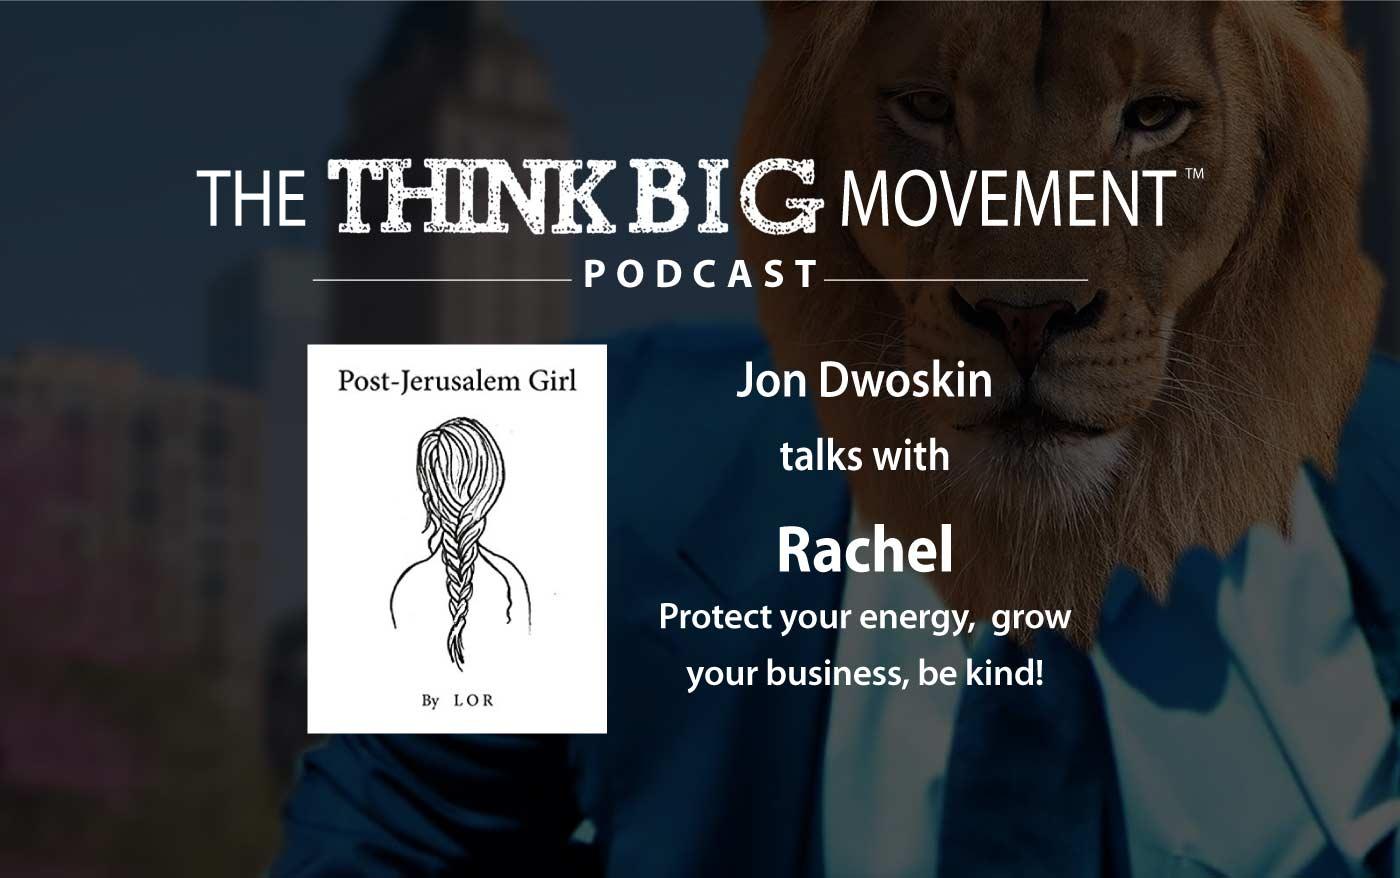 Think Big Movement Podcast - Jon Dwoskin Interviews Rachel